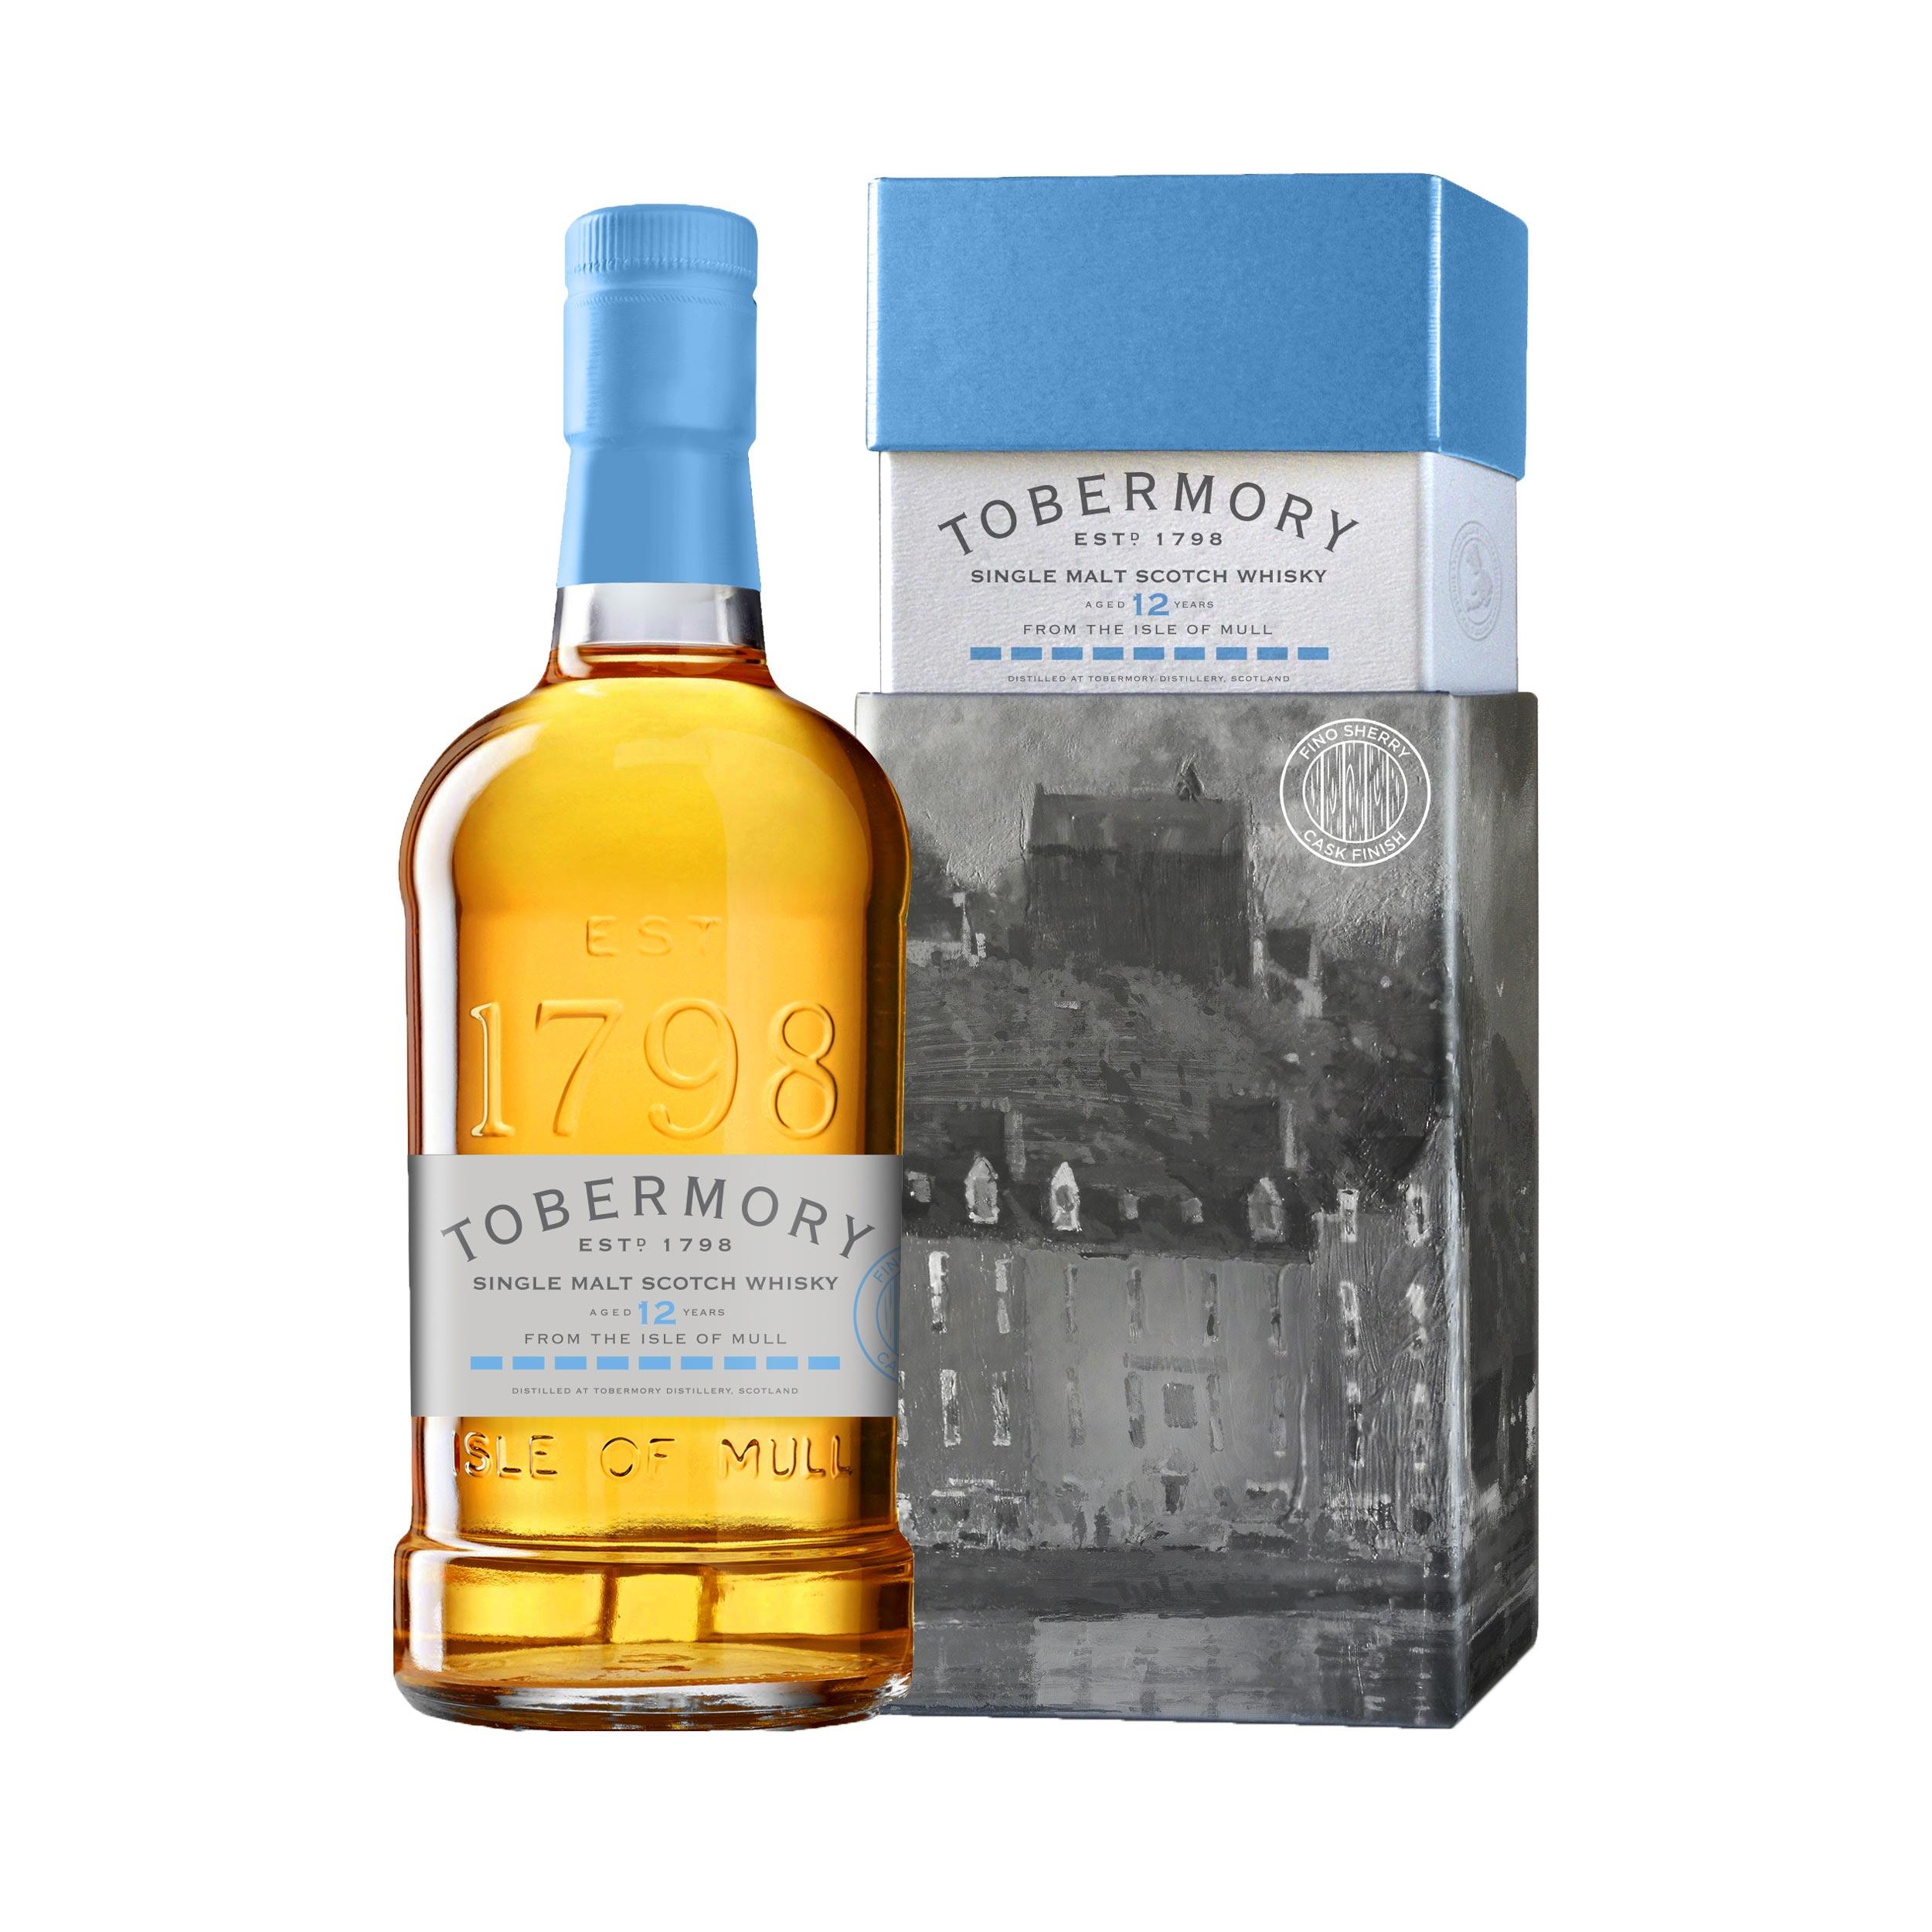 Tobermory 12 Year Old Fino Cask Finish Island Single Malt Scotch Whisky 70cl